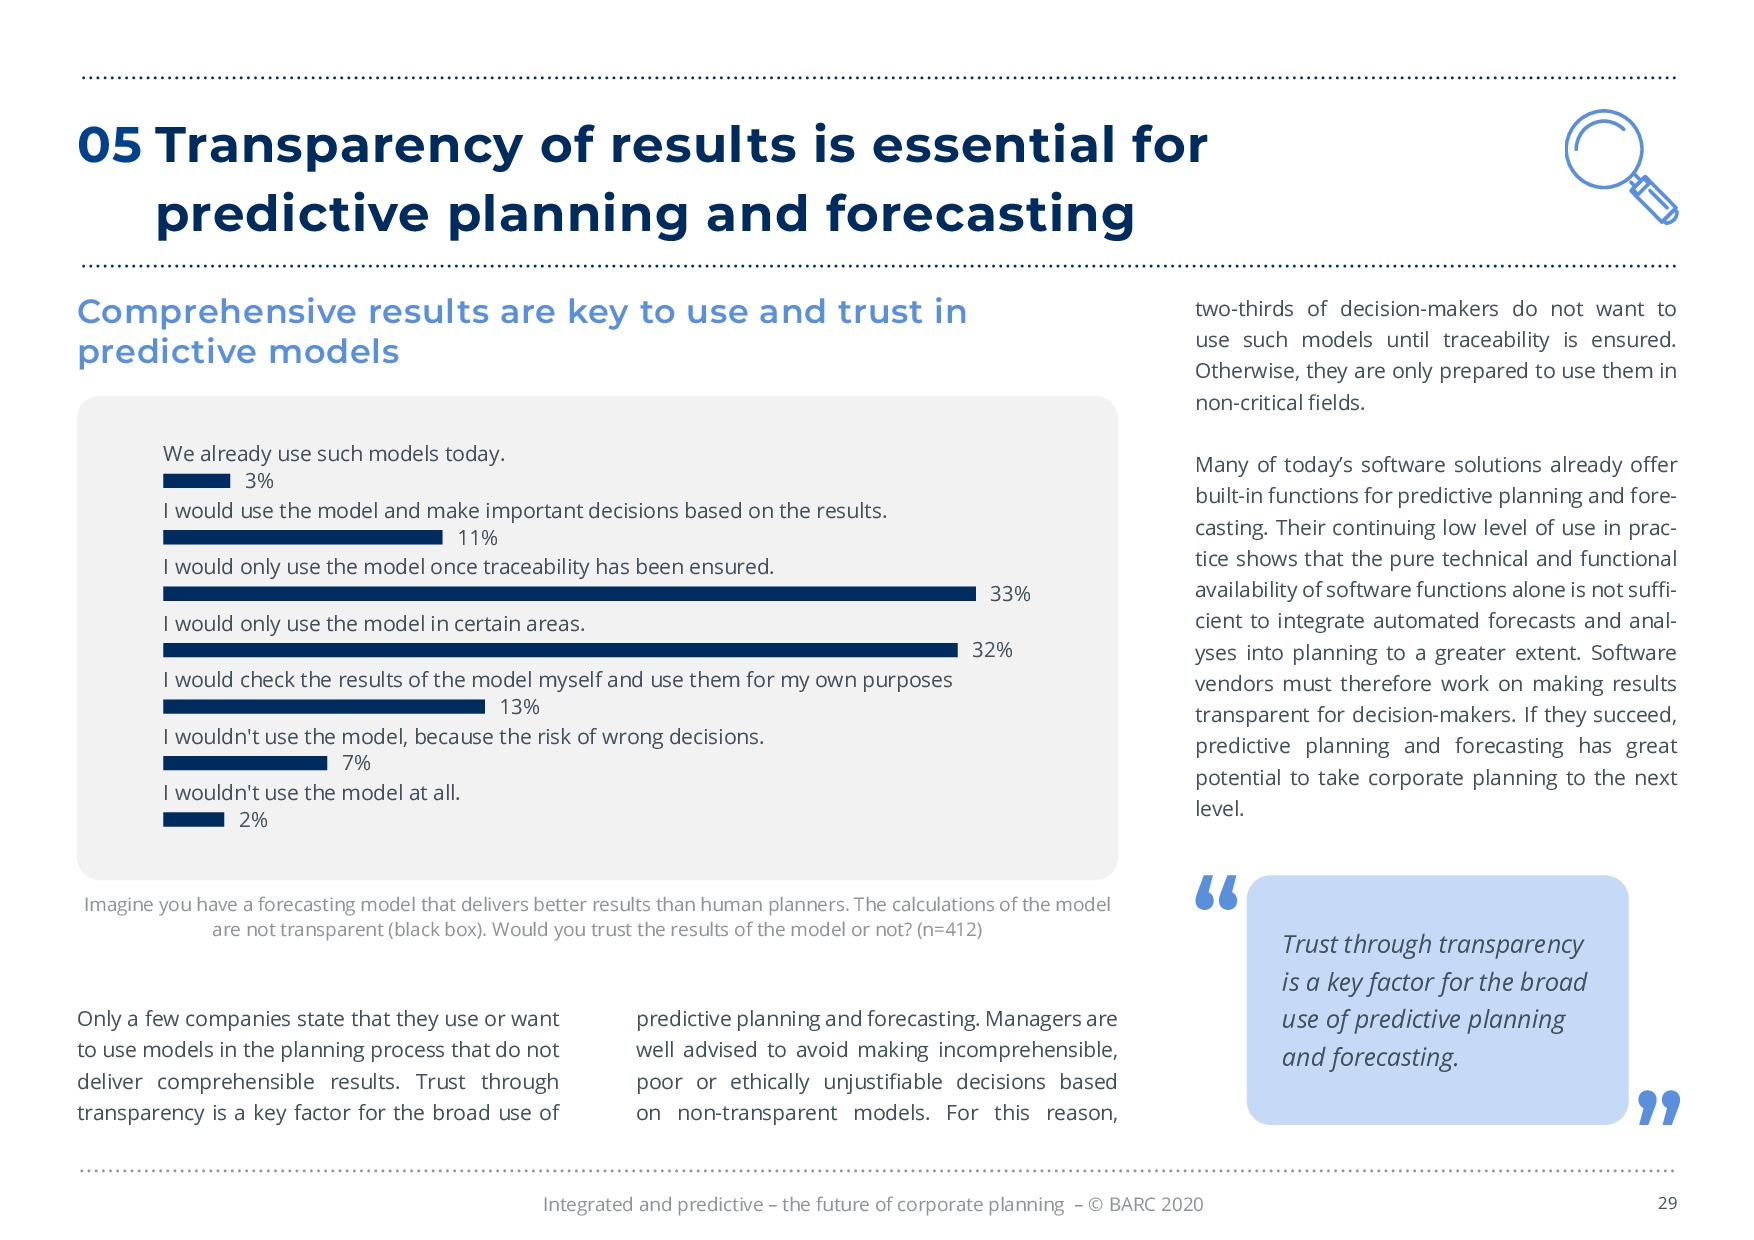 BARC – 統合と予測 – 経営計画の未来 | Page 29